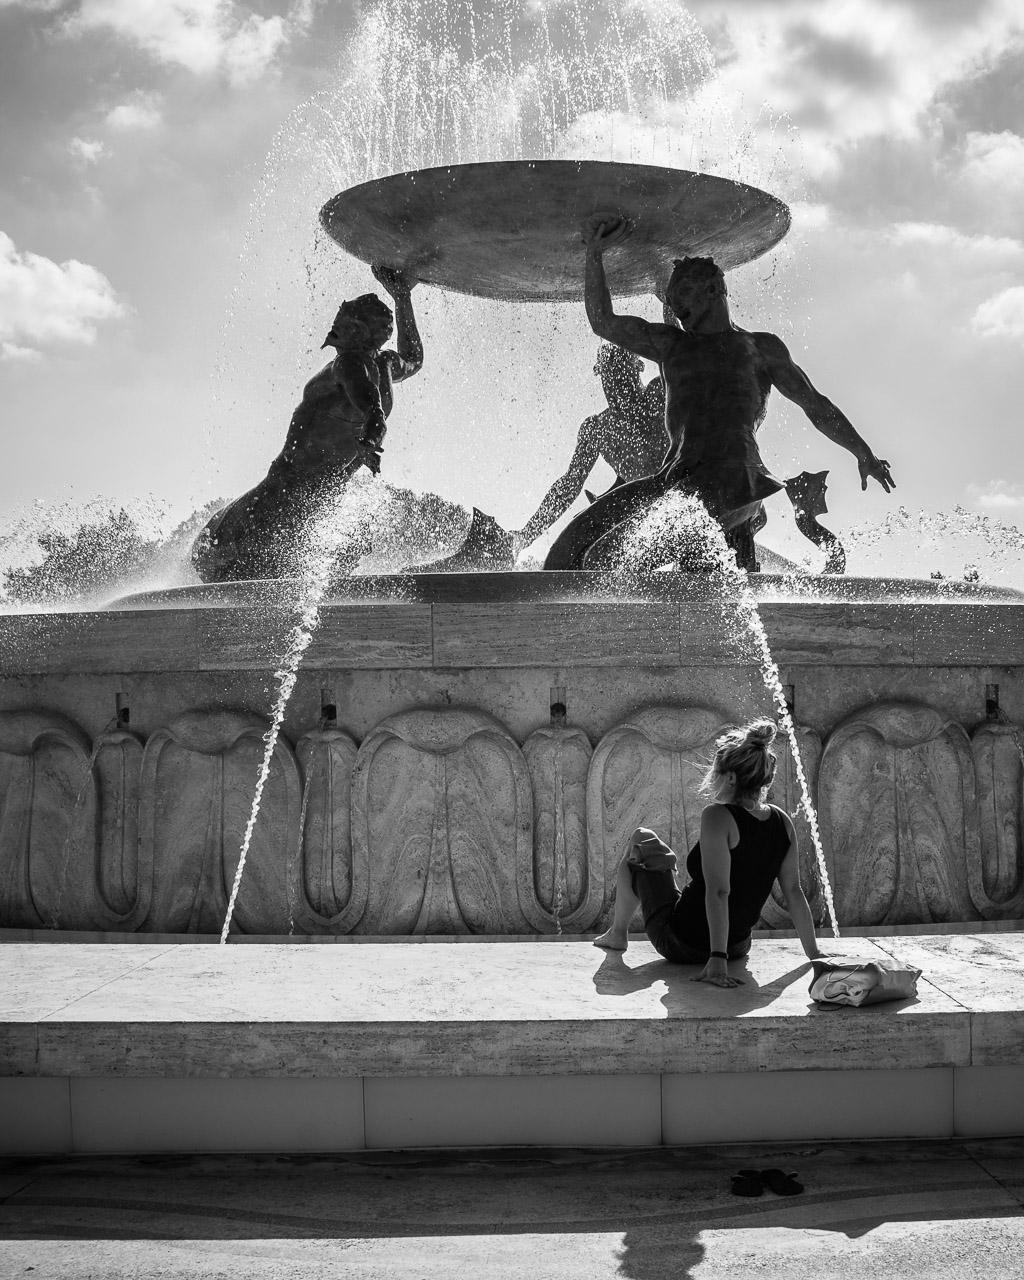 Enjoying the Tritons' Fountain